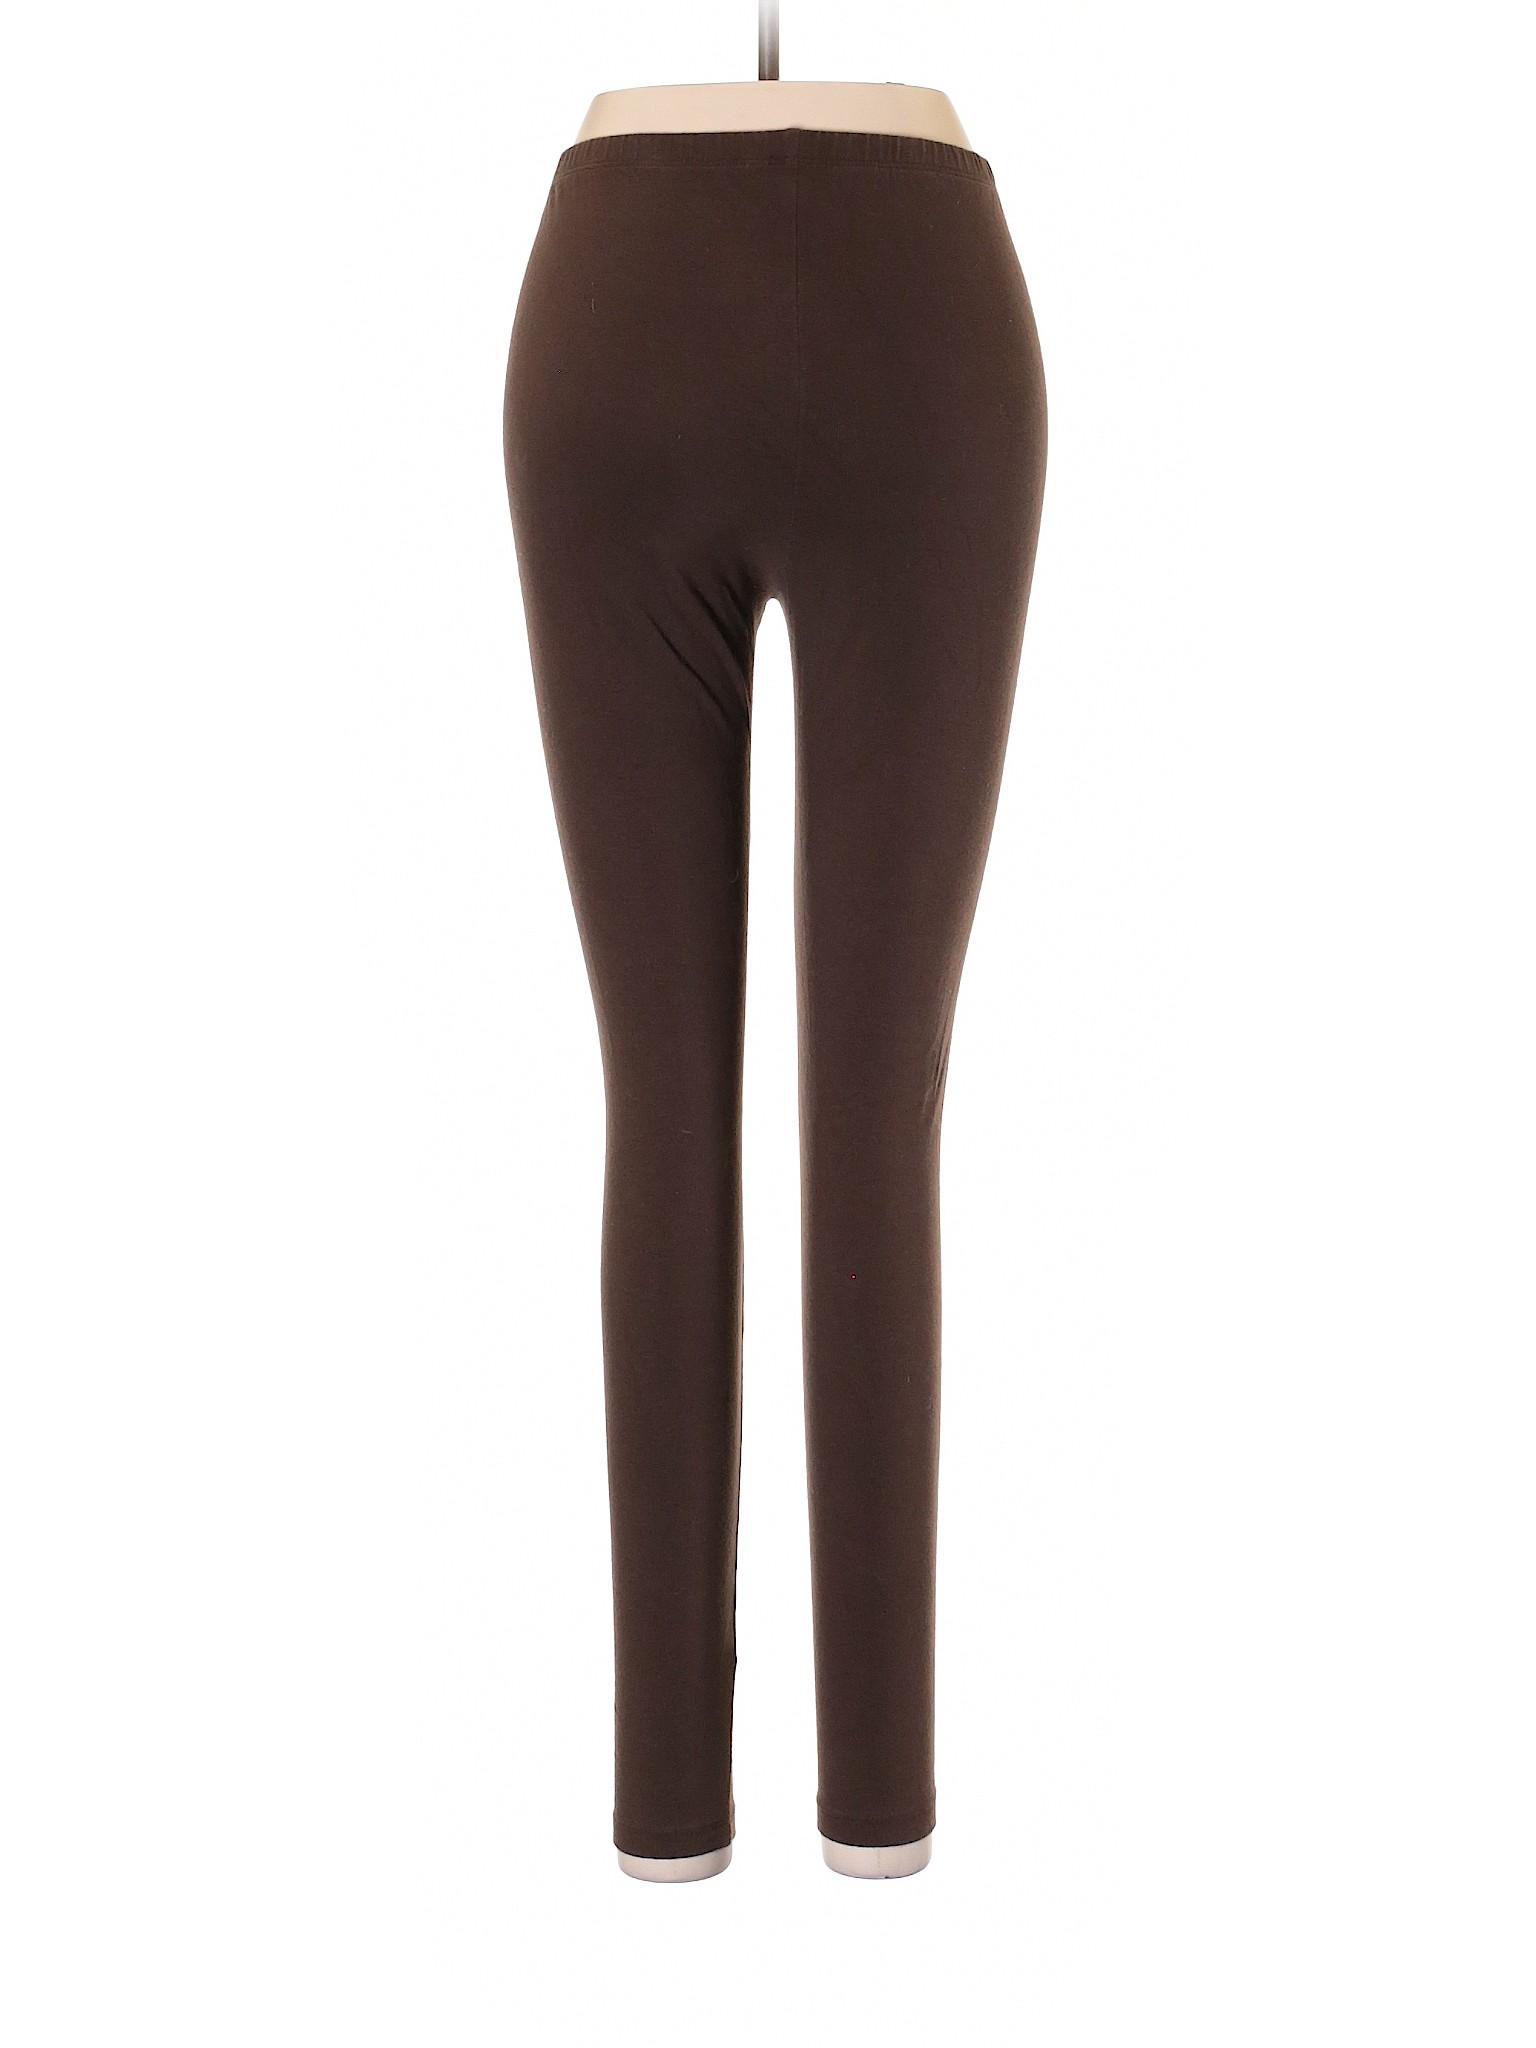 Simply Vera Wang Boutique leisure Leggings Vera POqwx40S